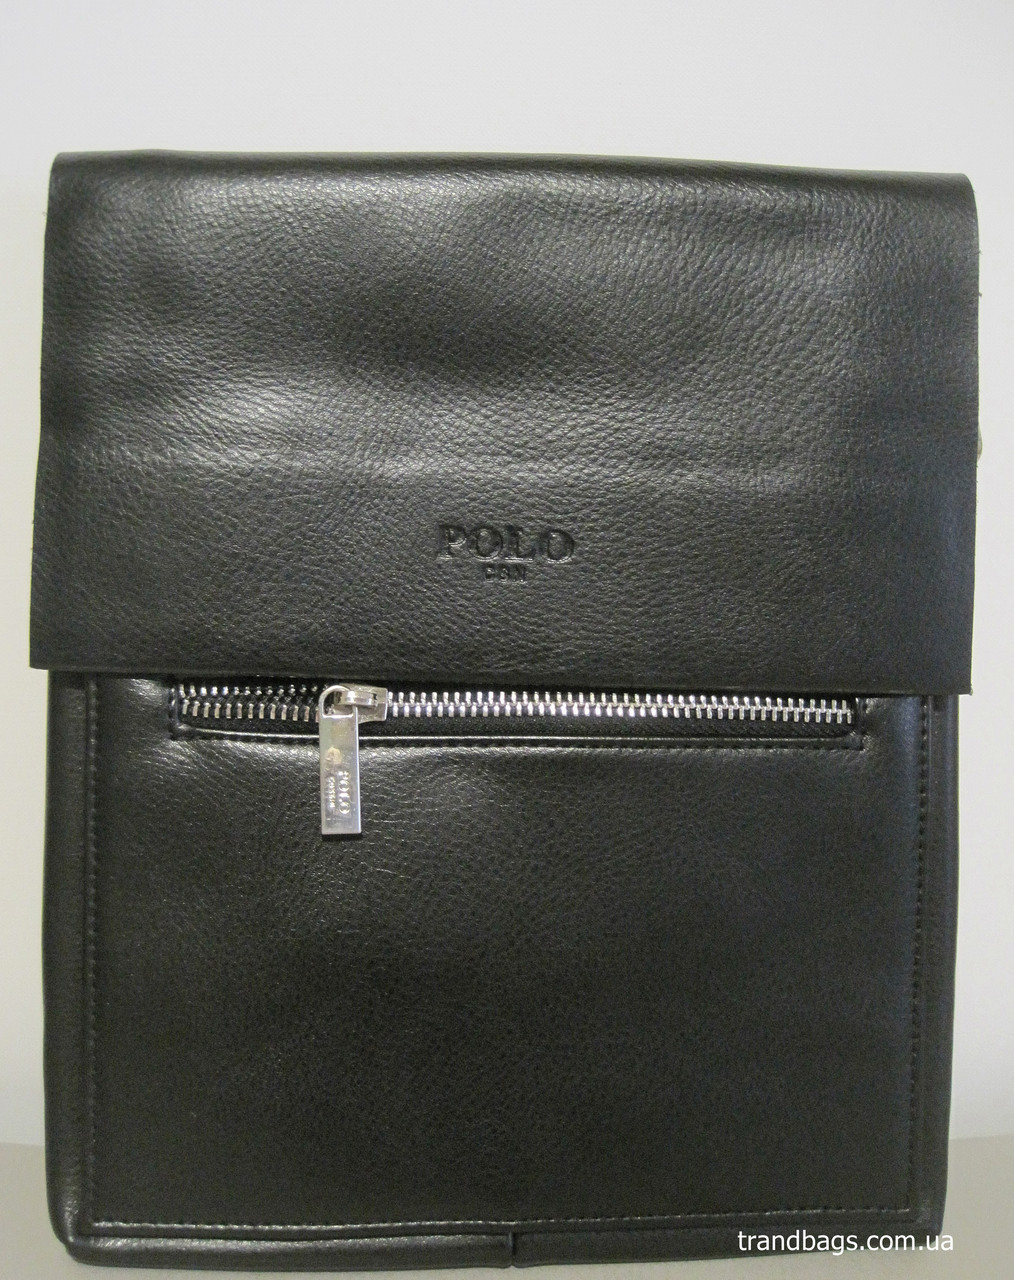 be76309d4c39 Мужская сумка 310-3 black POLO мужская сумка на плечо не дорого Одесса 7 км